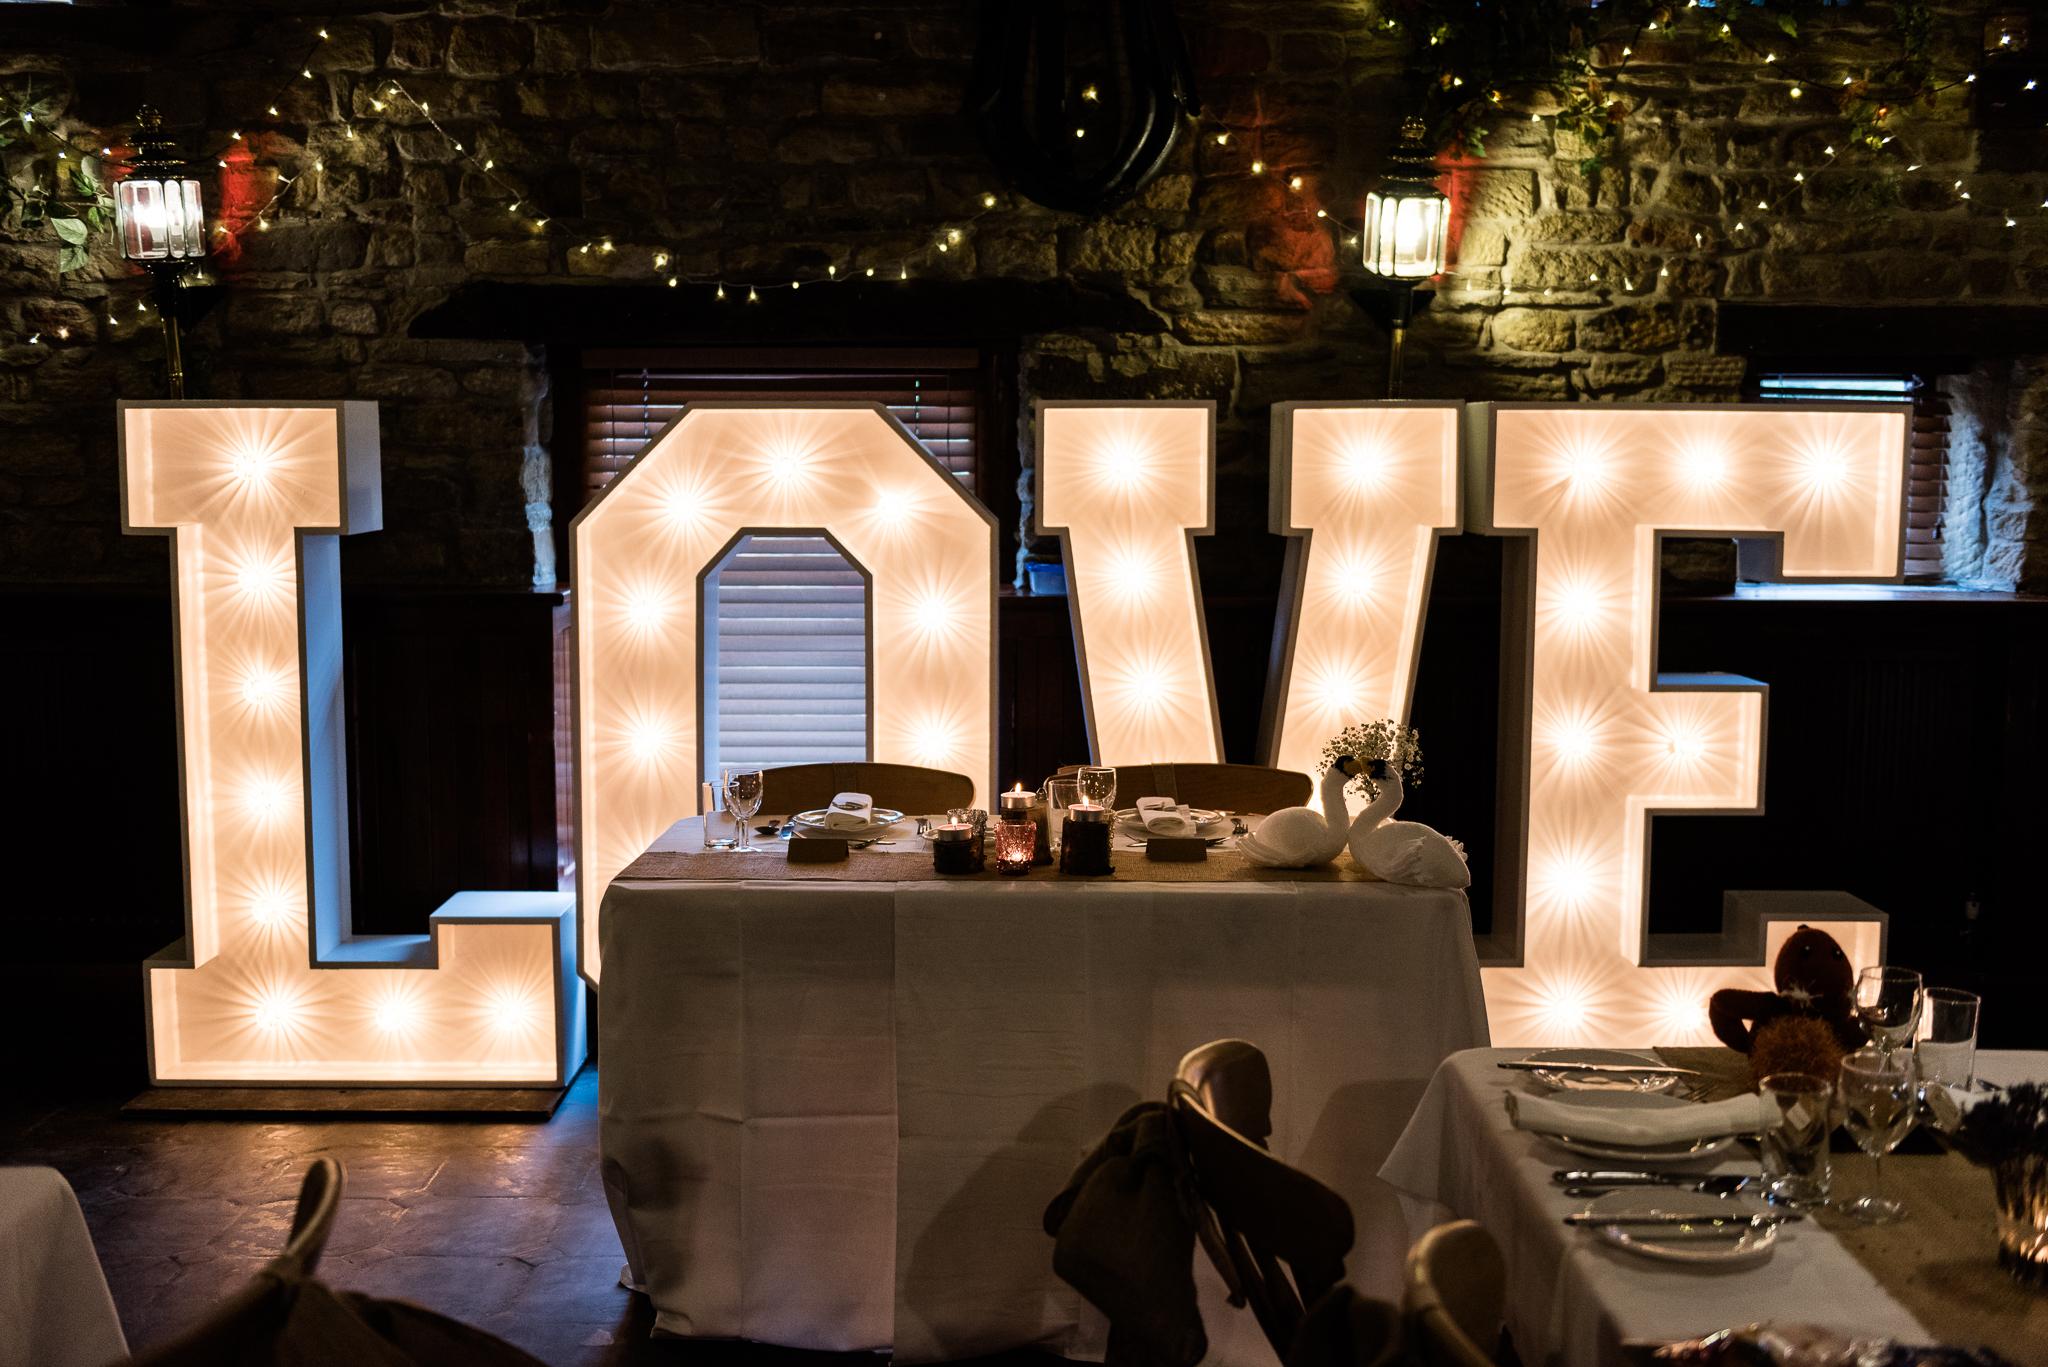 Yorkshire Wedding Photography Spring Wedding Cubley Hall Rustic Barn-38.jpg